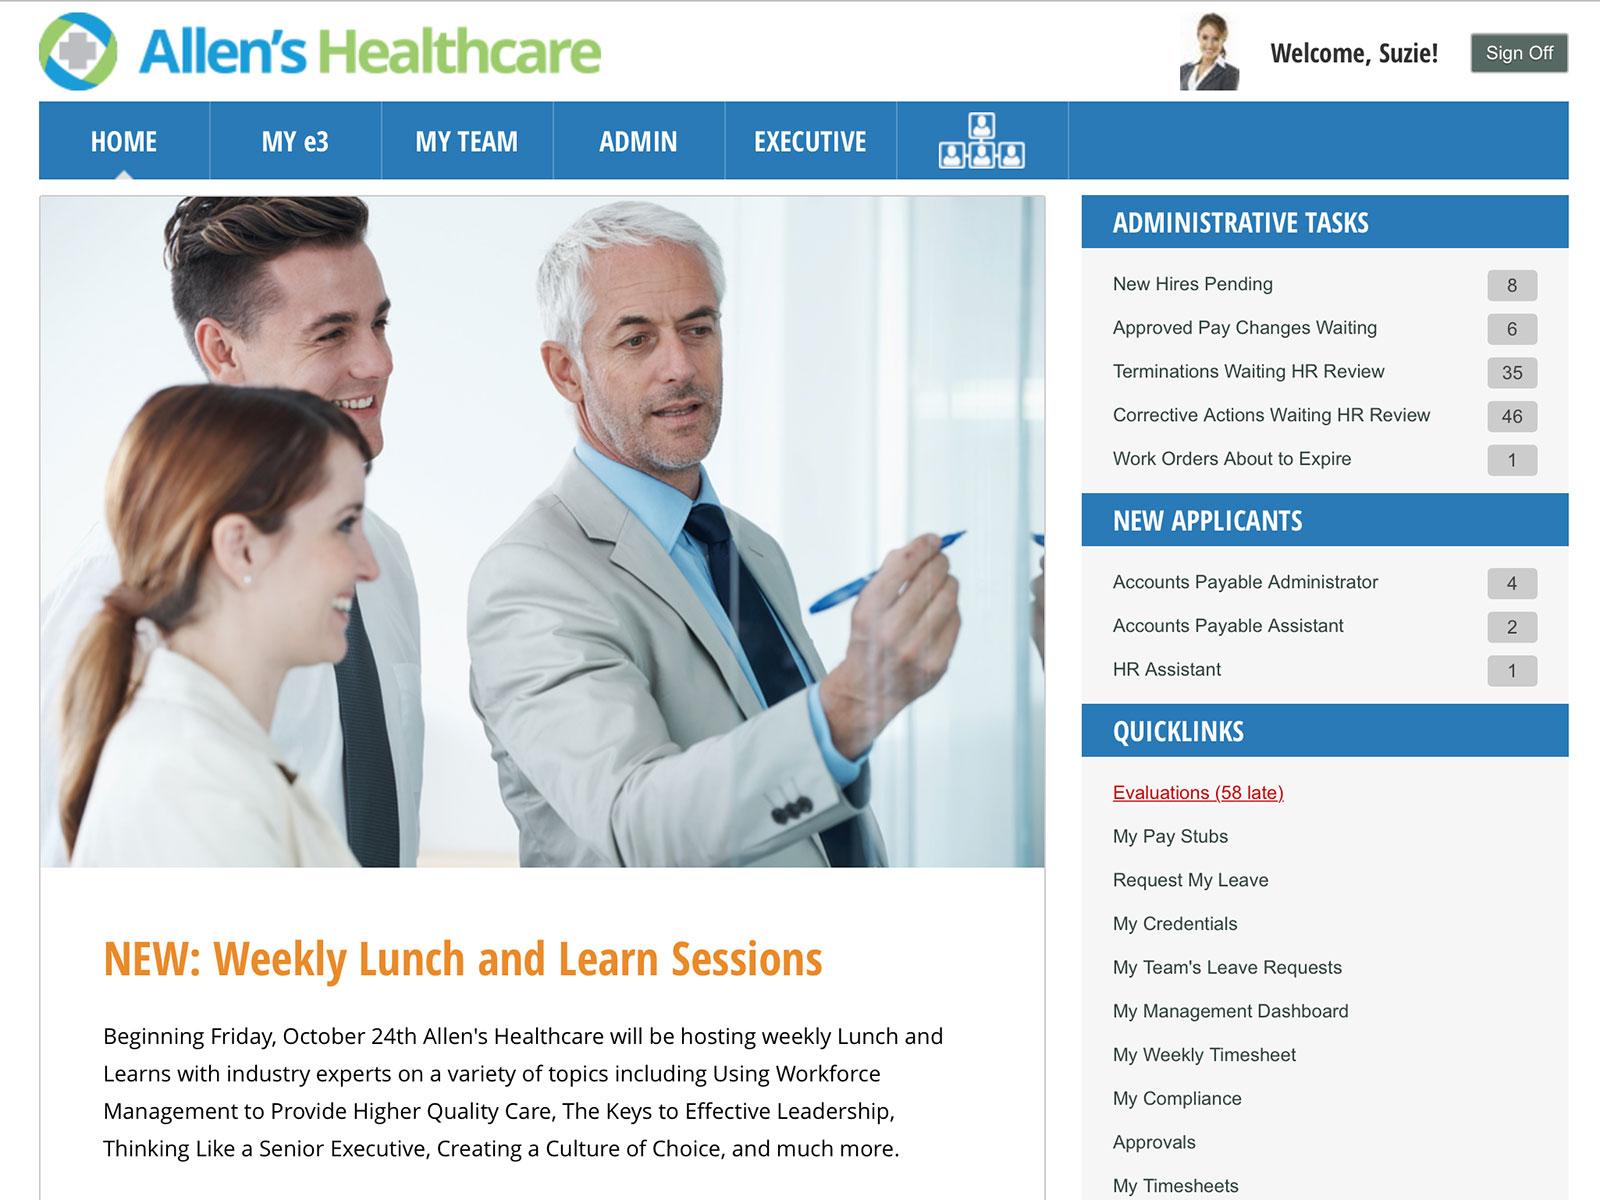 Configurable Company Home Page